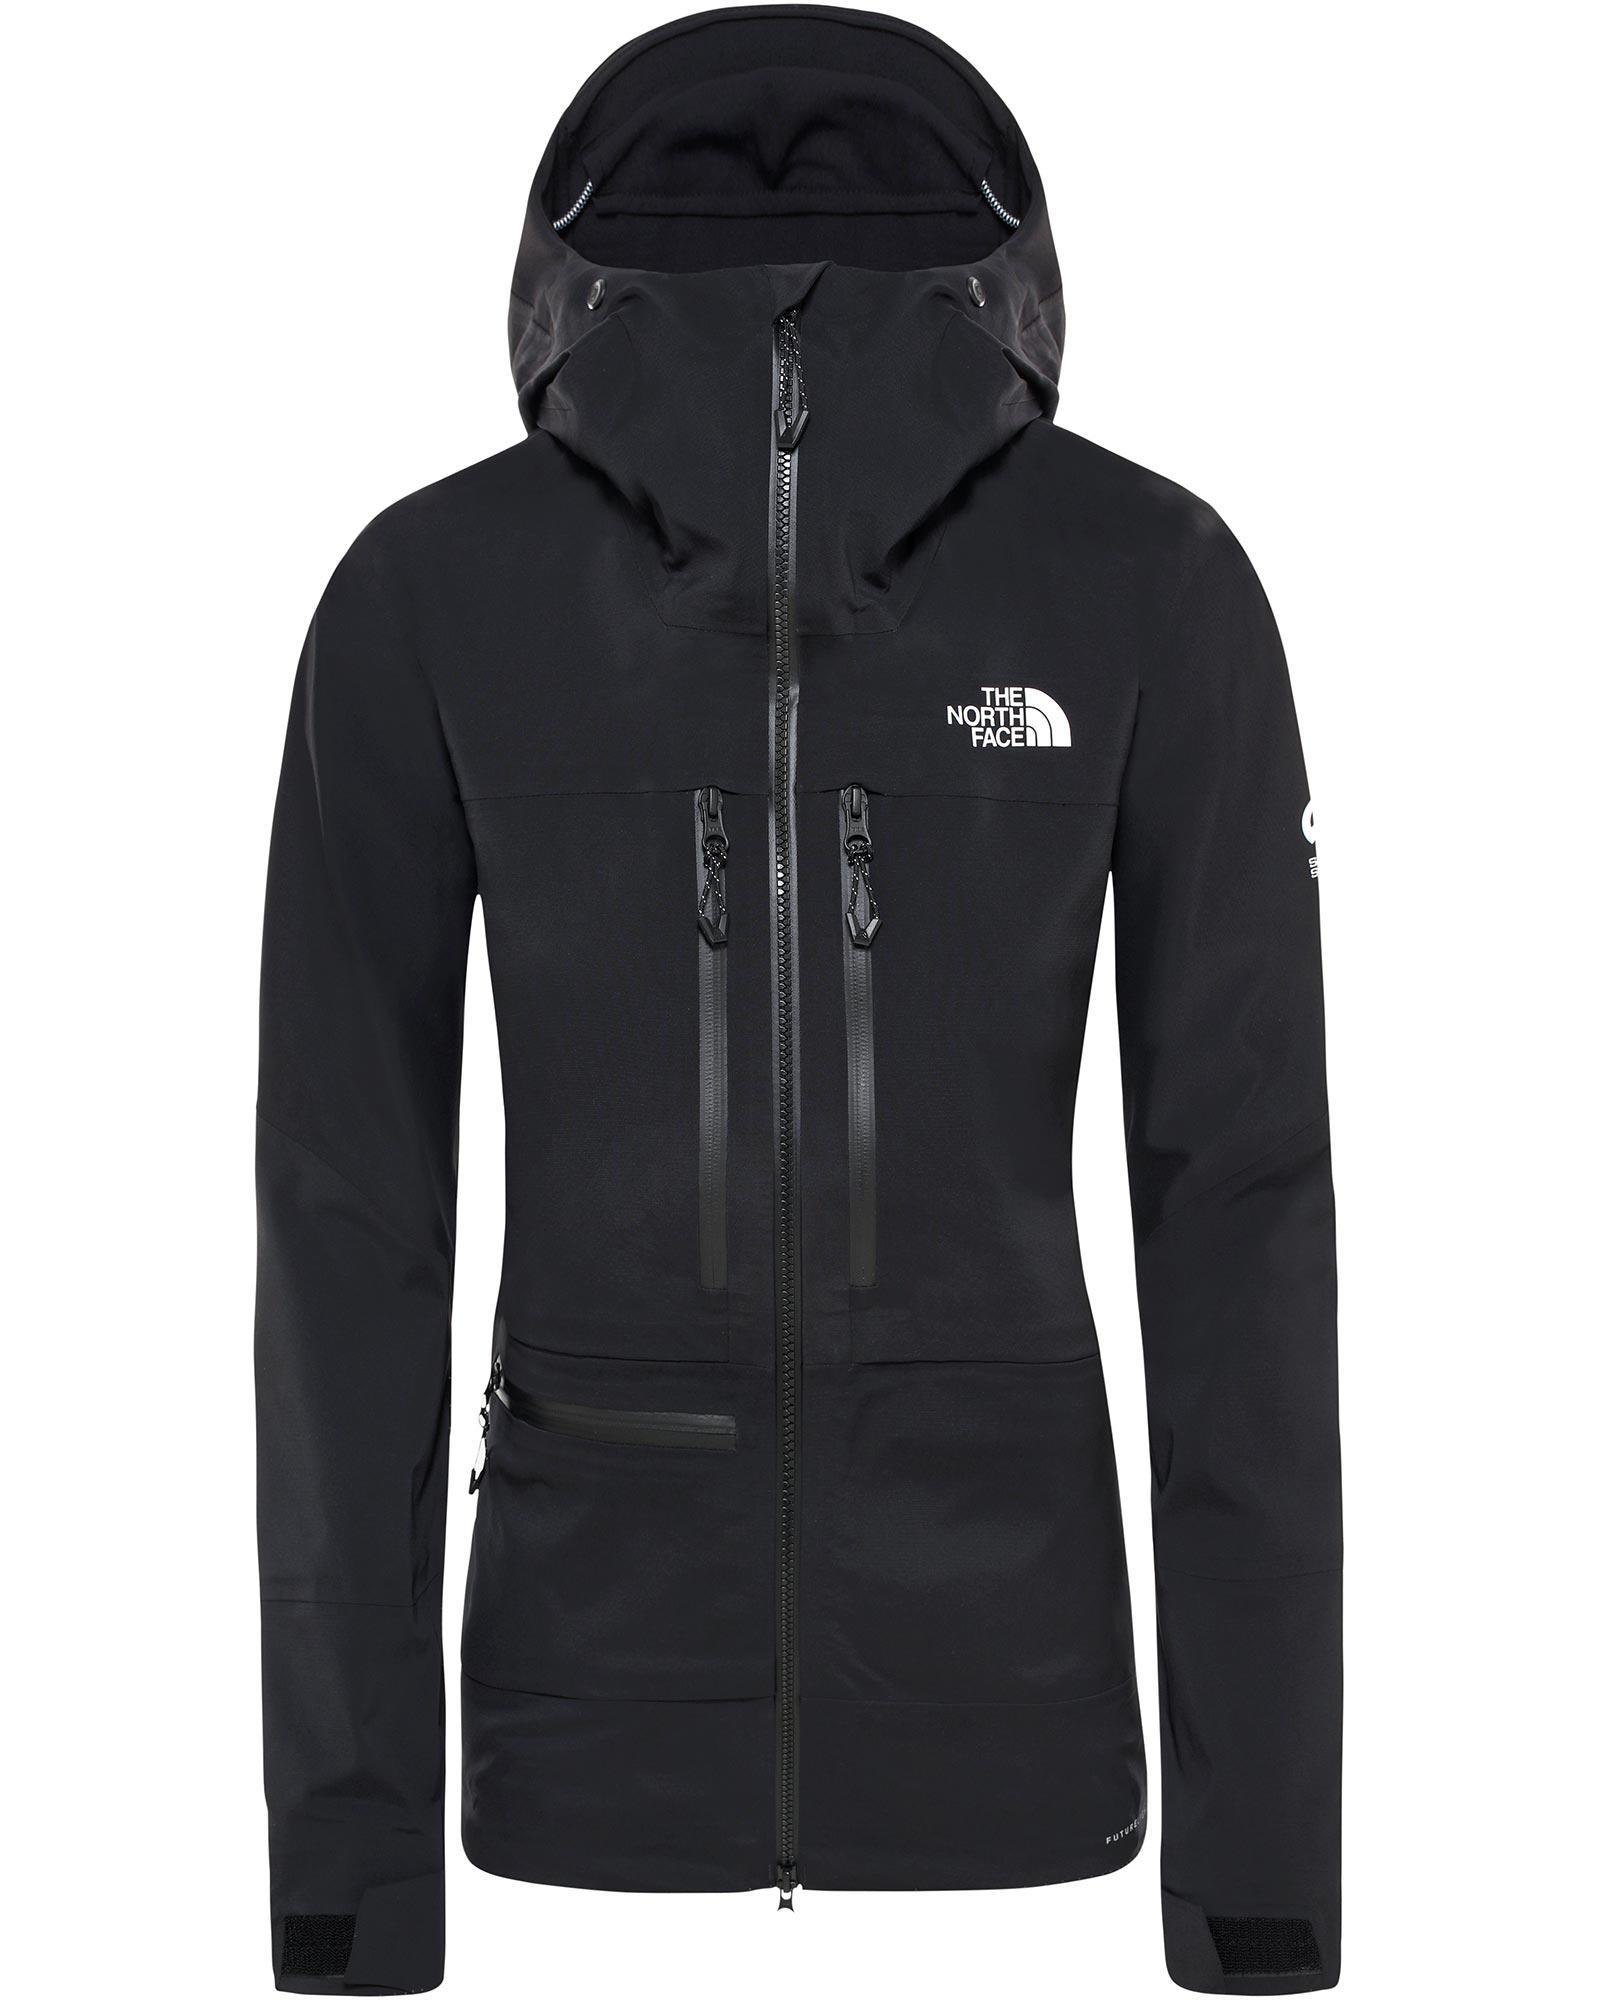 The North Face Women's Summit Series L5 FUTURELIGHT Jacket 0